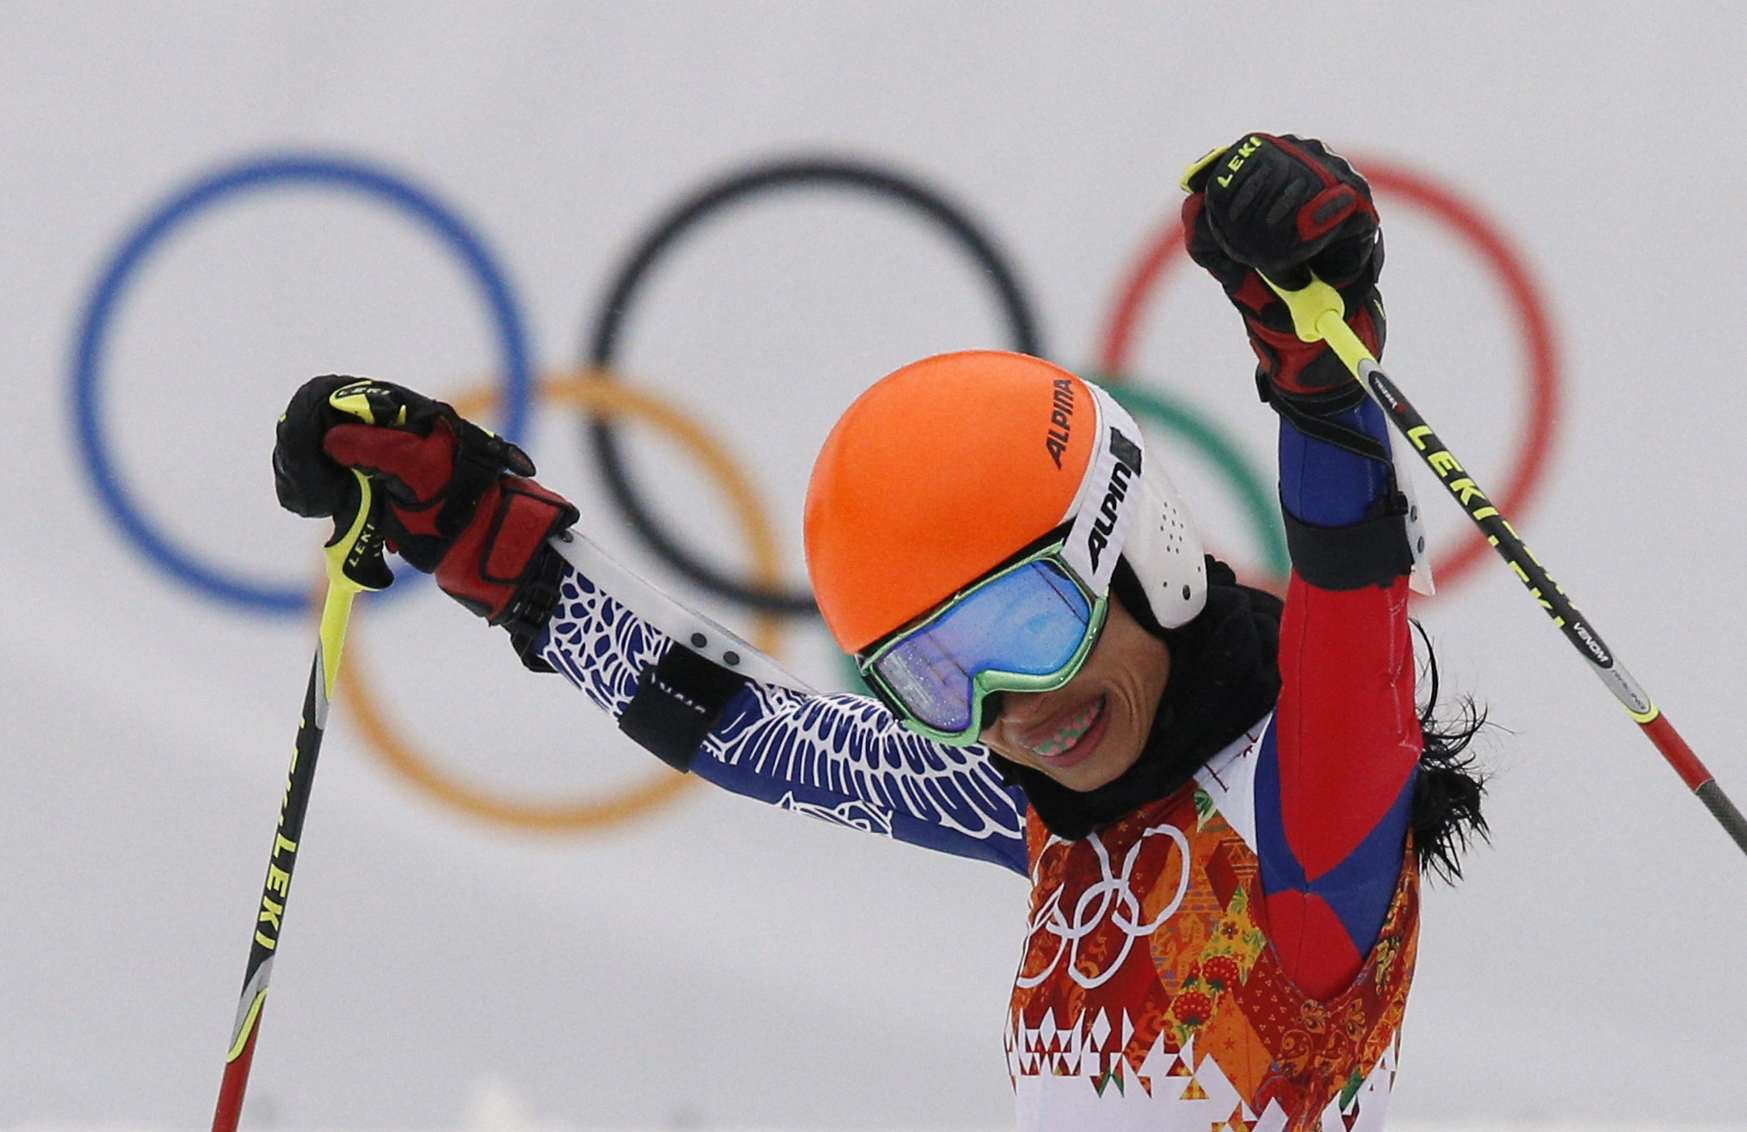 Ванесса Мэй сбирается на Олимпиаду-2018